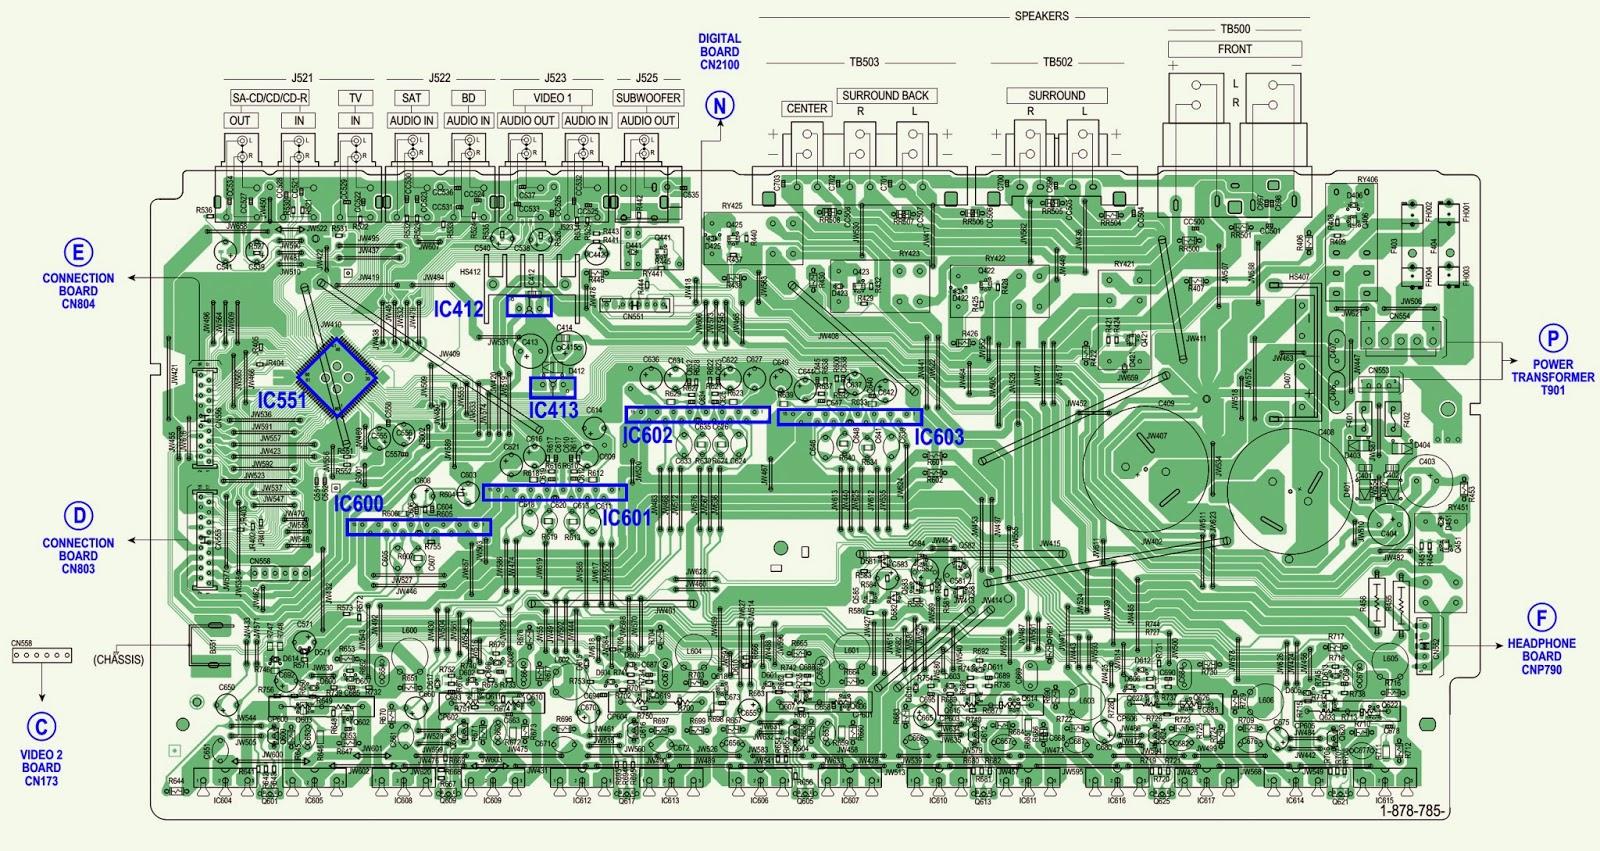 Sony Str Km7600 Australia Main Board moreover Anthropogenic Air Pollution Sources additionally Domestic Refrigerator Parts likewise Mfj 259b calibration also Consejos Para Principiantes I. on troubleshooting diagram